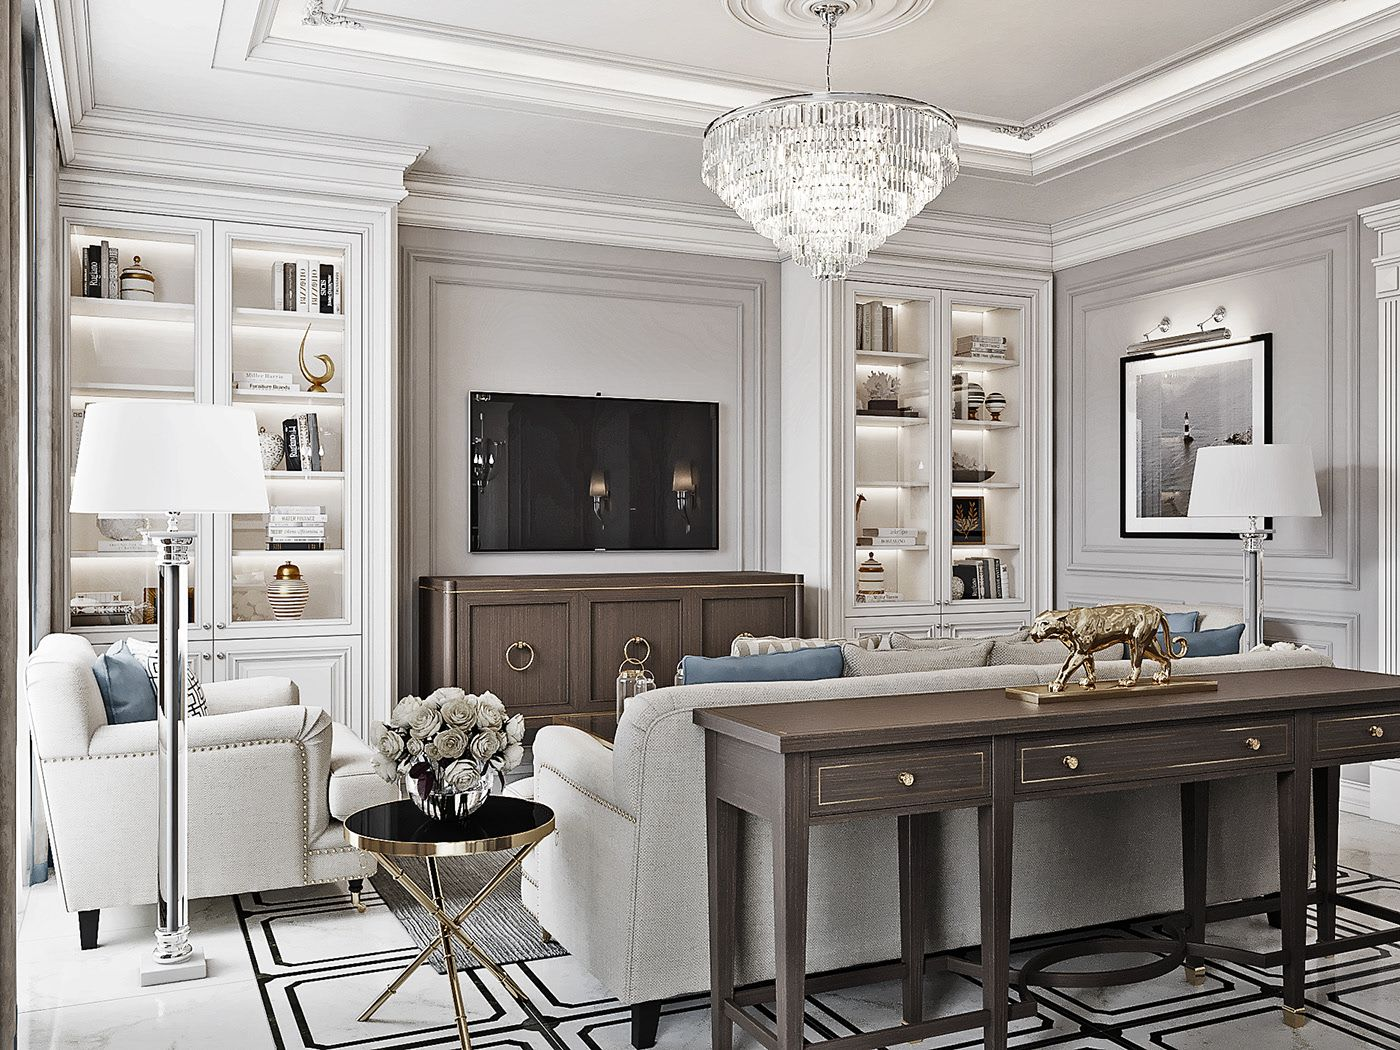 The Apartment In Vladimir Livingroom New Classic Style On Behance Desain Interior Desain Rumah Rumah